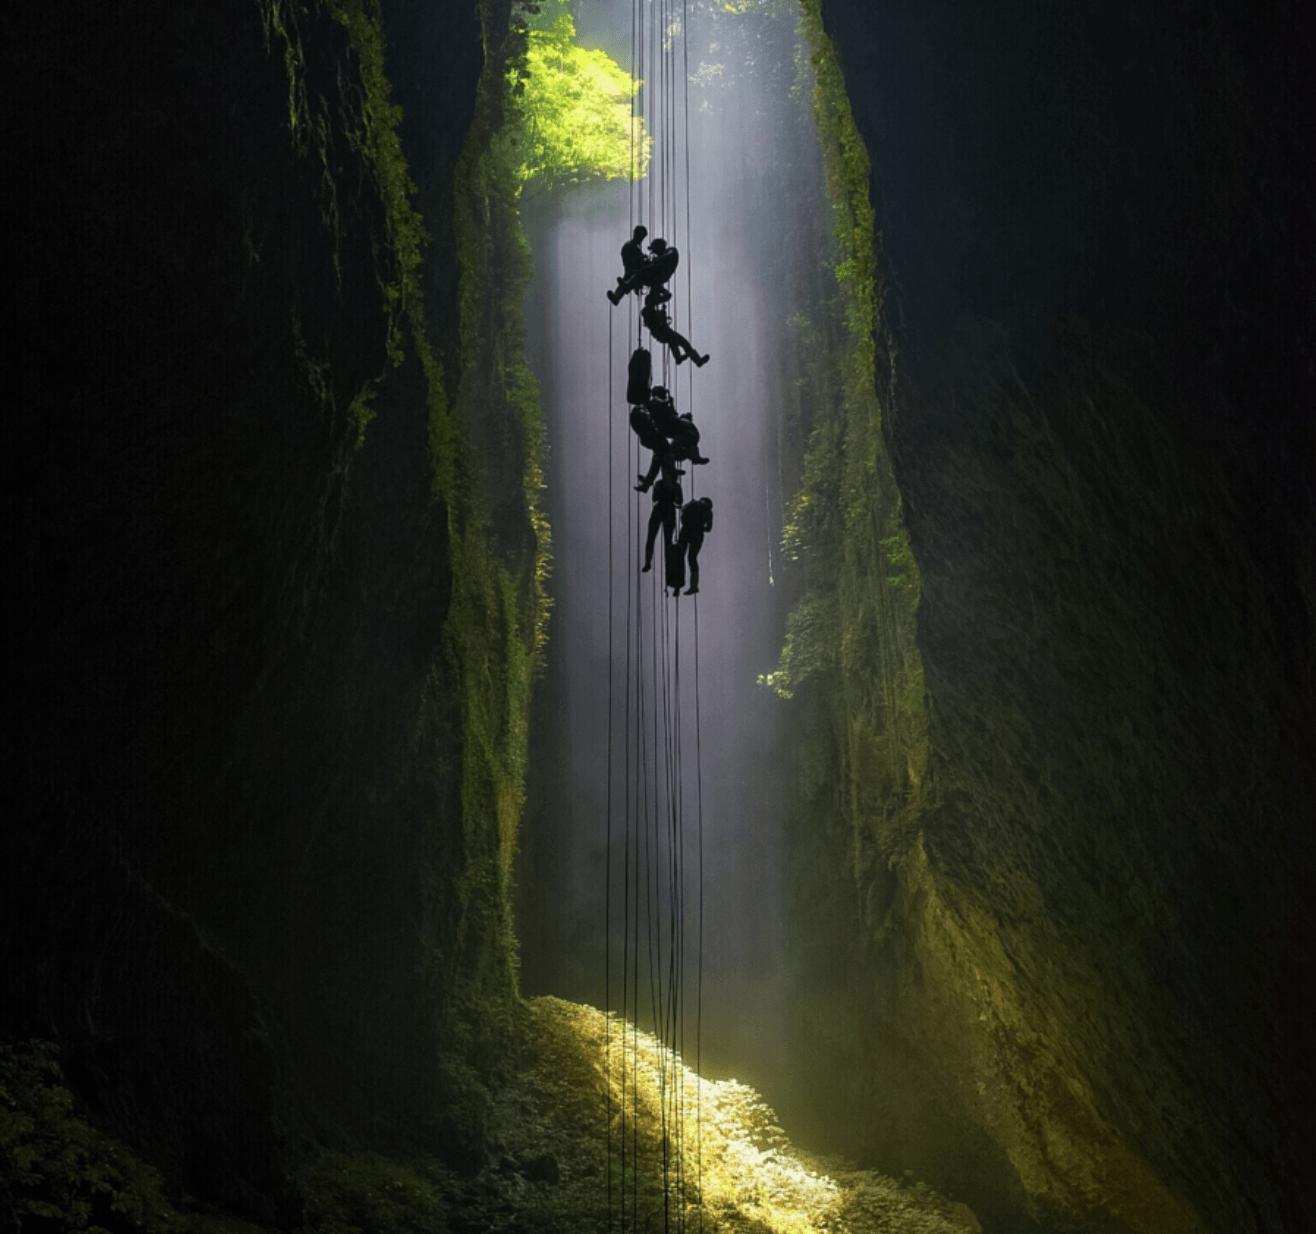 Descent into Heaven by Ben Babusis